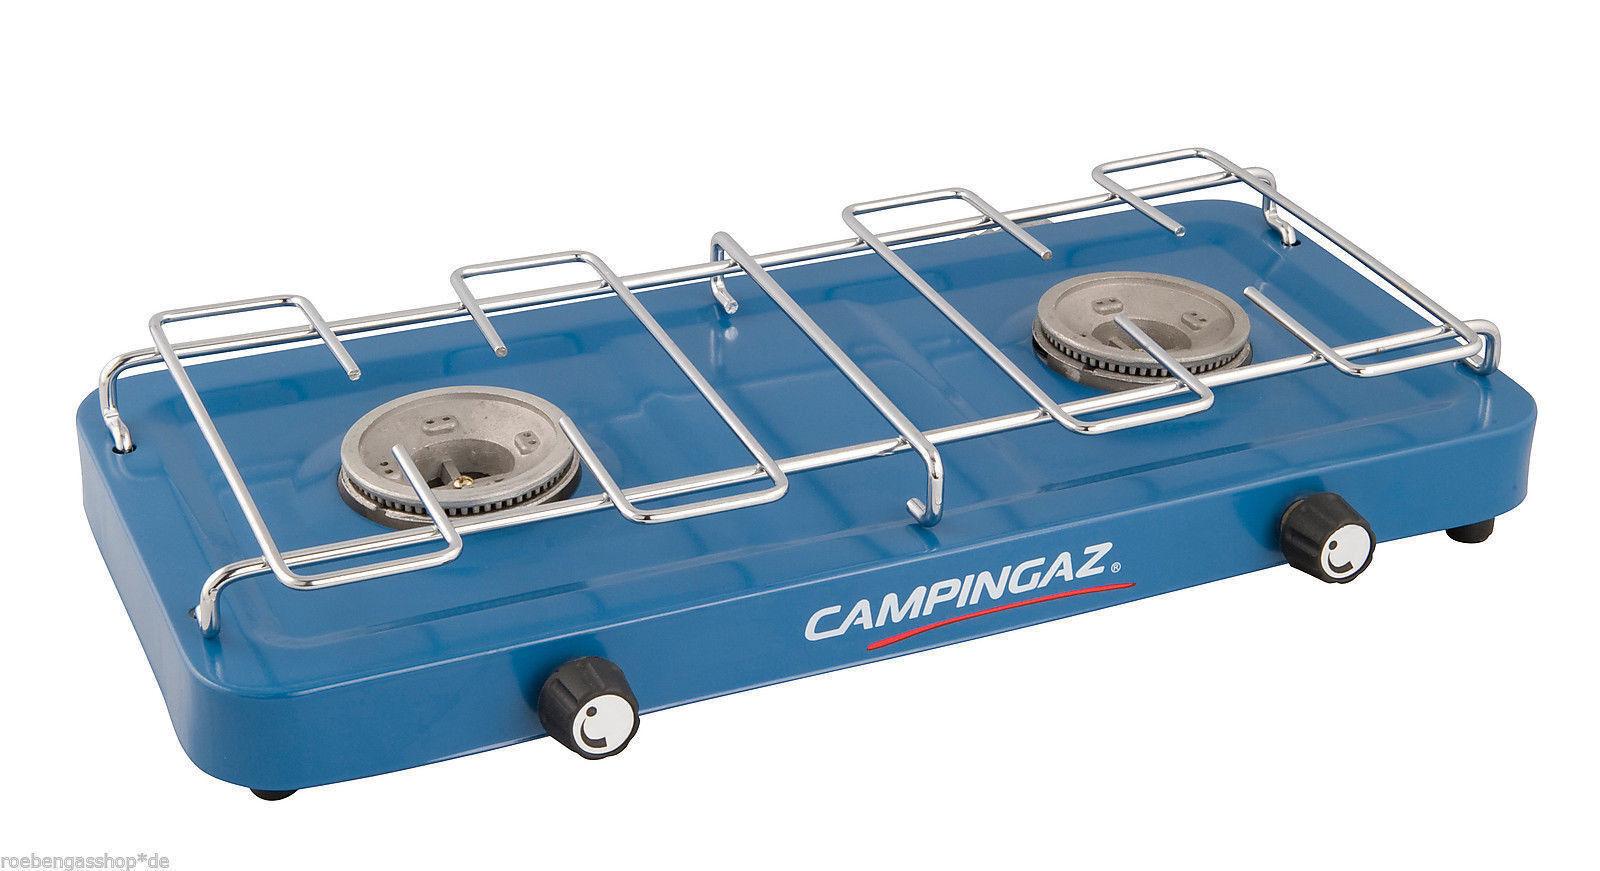 Campingaz Base Camp Camp Camp 3,2 KW 2 flammkocher cuisson ad966d